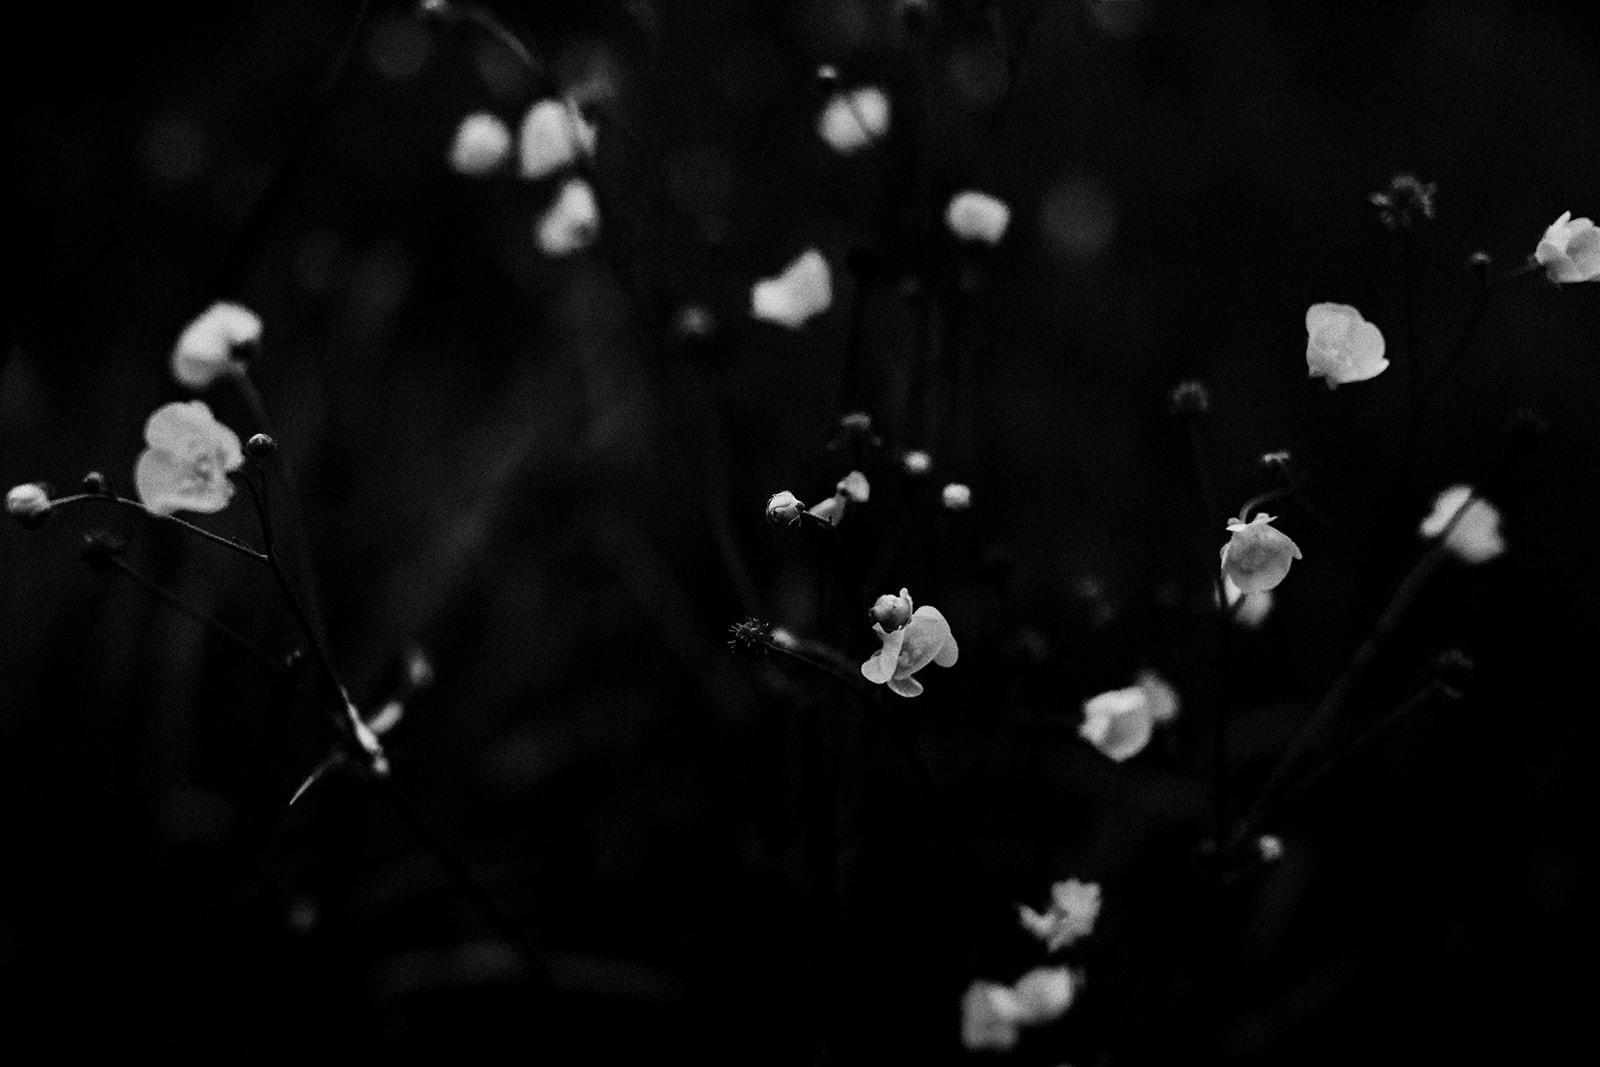 Rachael_Sommessa_Photography14.jpg